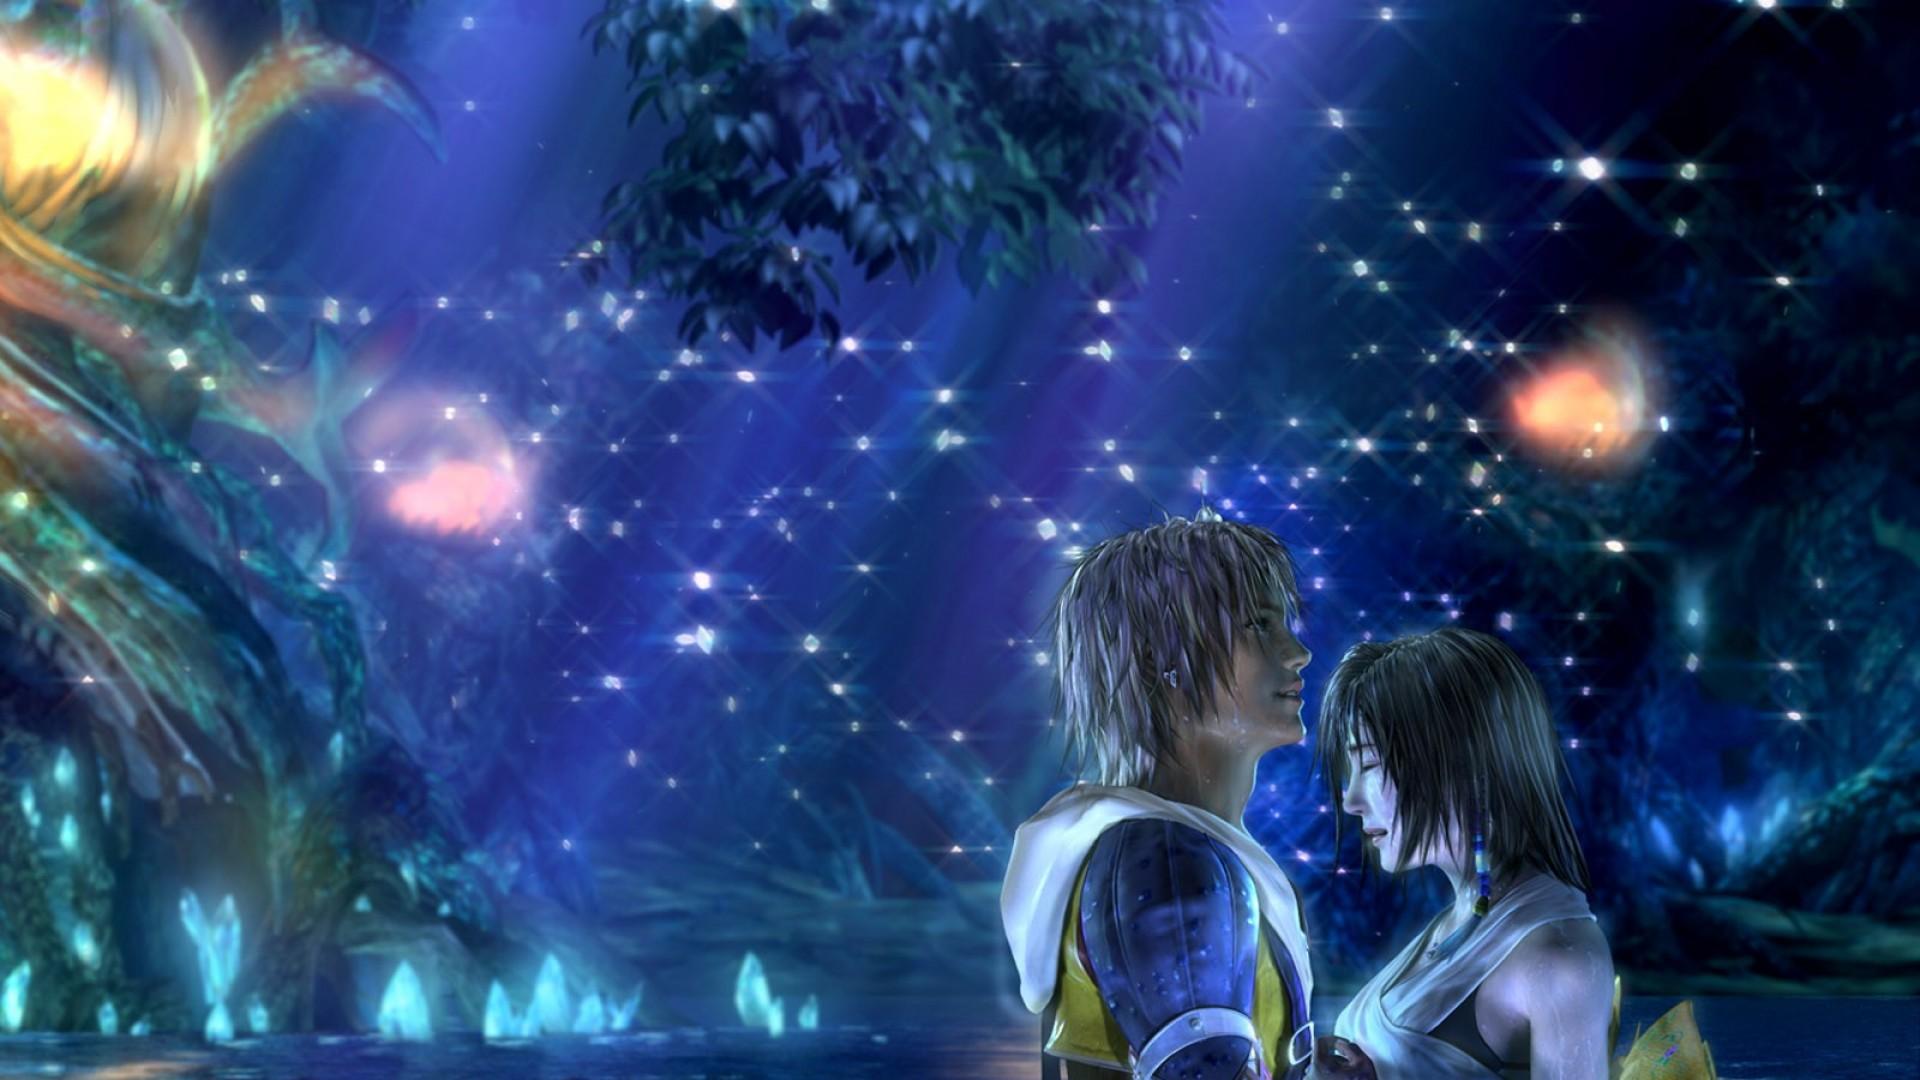 final-fantasy-x-night-sky-squaresoft-hd-302193